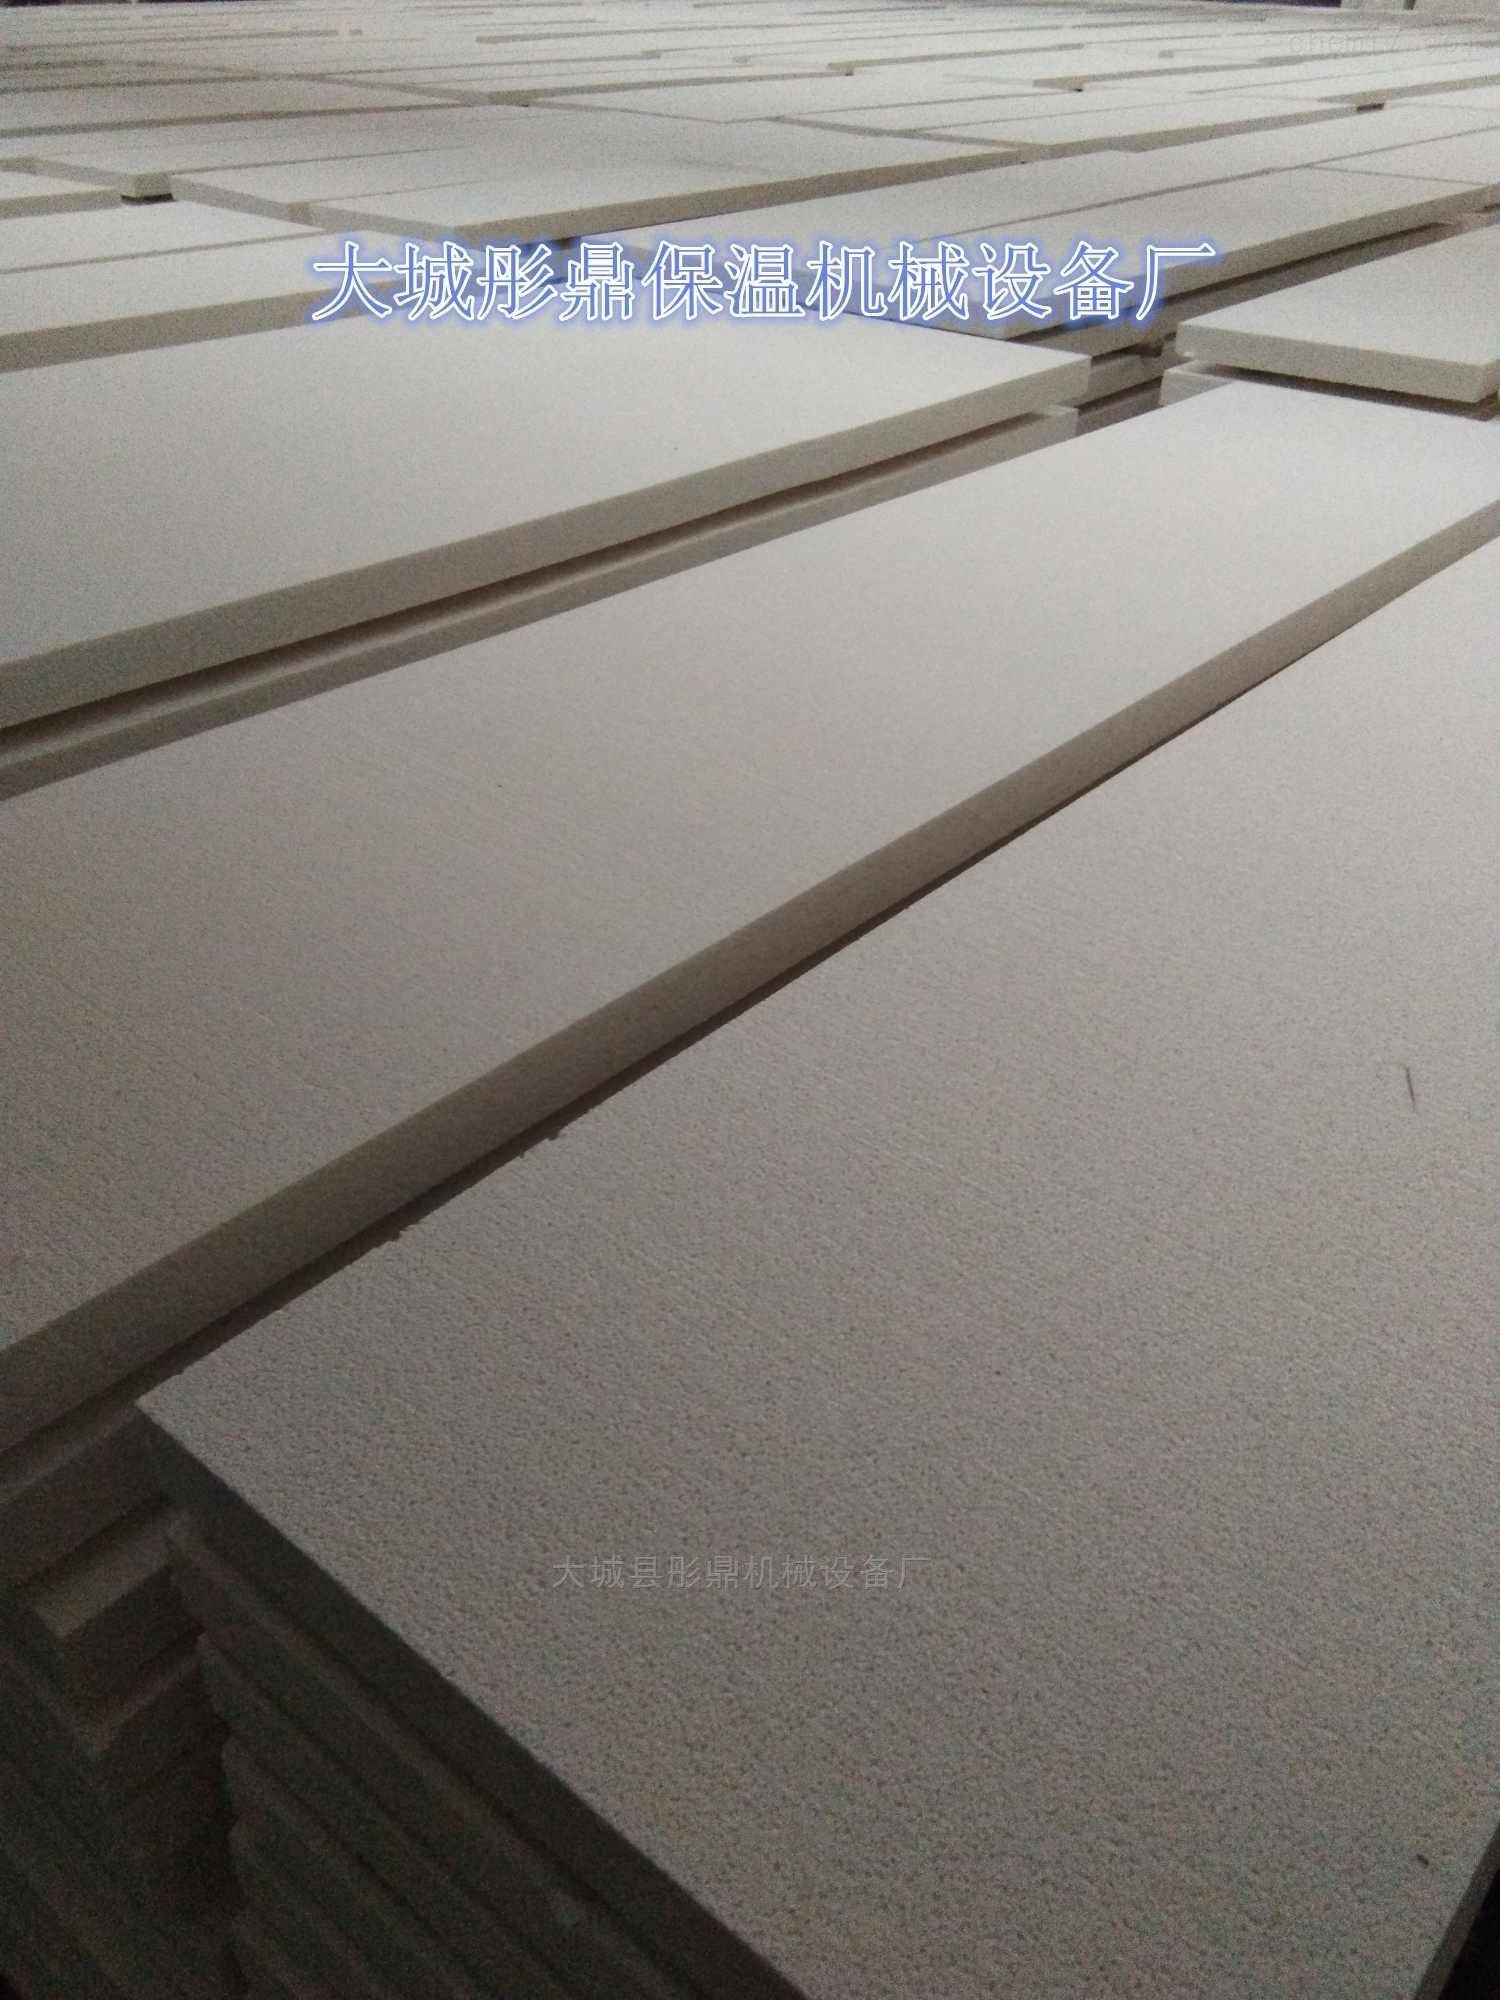 A2级聚合聚苯板设备